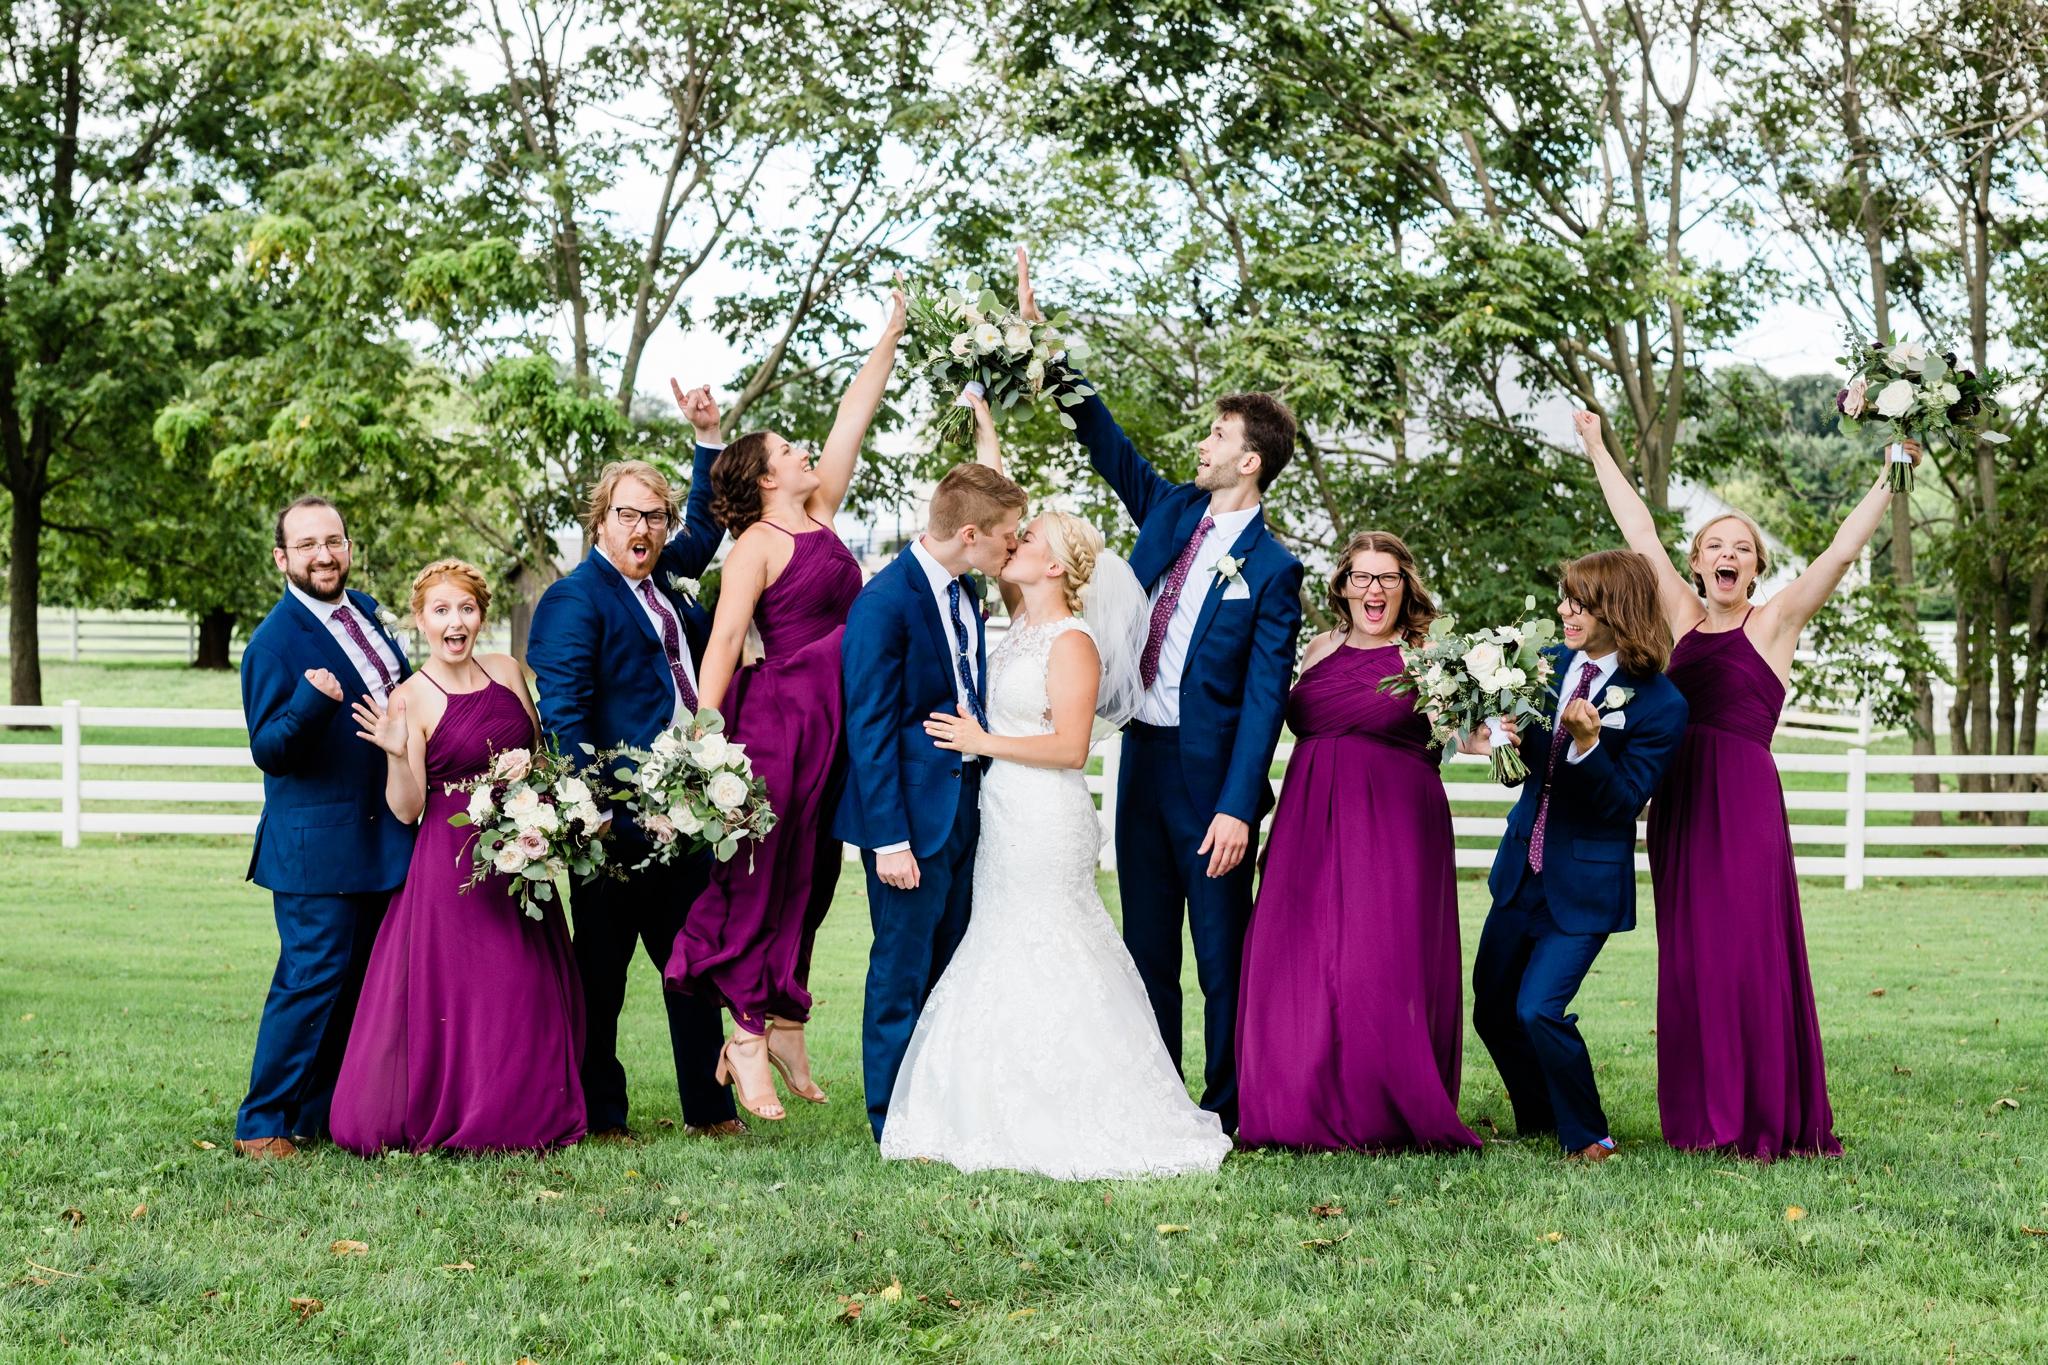 Emily Grace Photography, Lancaster PA Wedding Photographer, Wedding Photography for Unique Couples, The Barn at Silverstone, Lancaster PA Wedding Venue, The Barn at Silverstone Wedding Party Photos